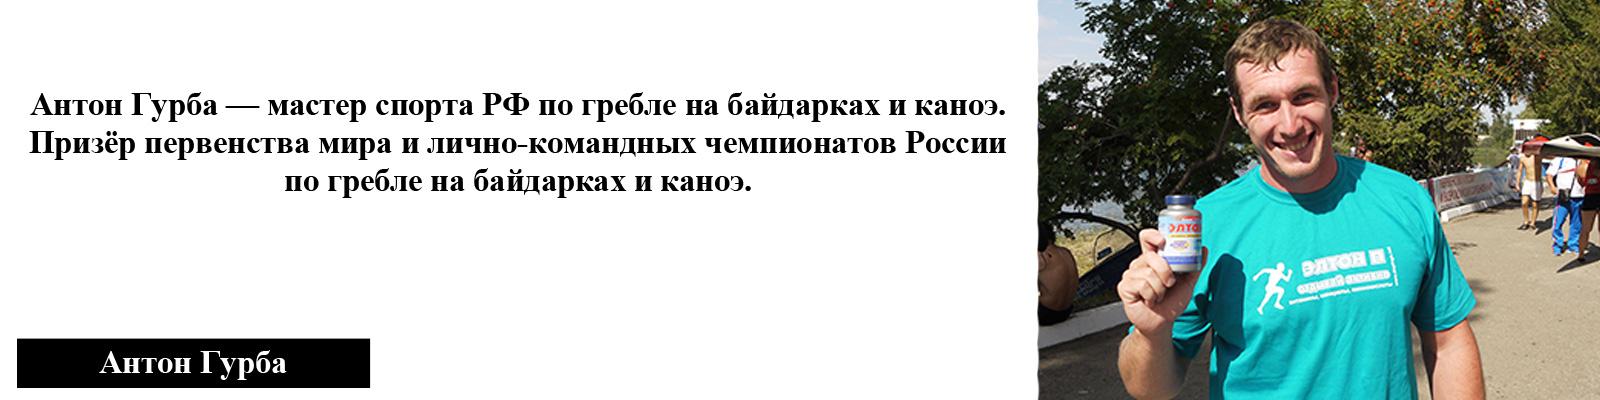 Мастер спорта по гребле Антон Гурба